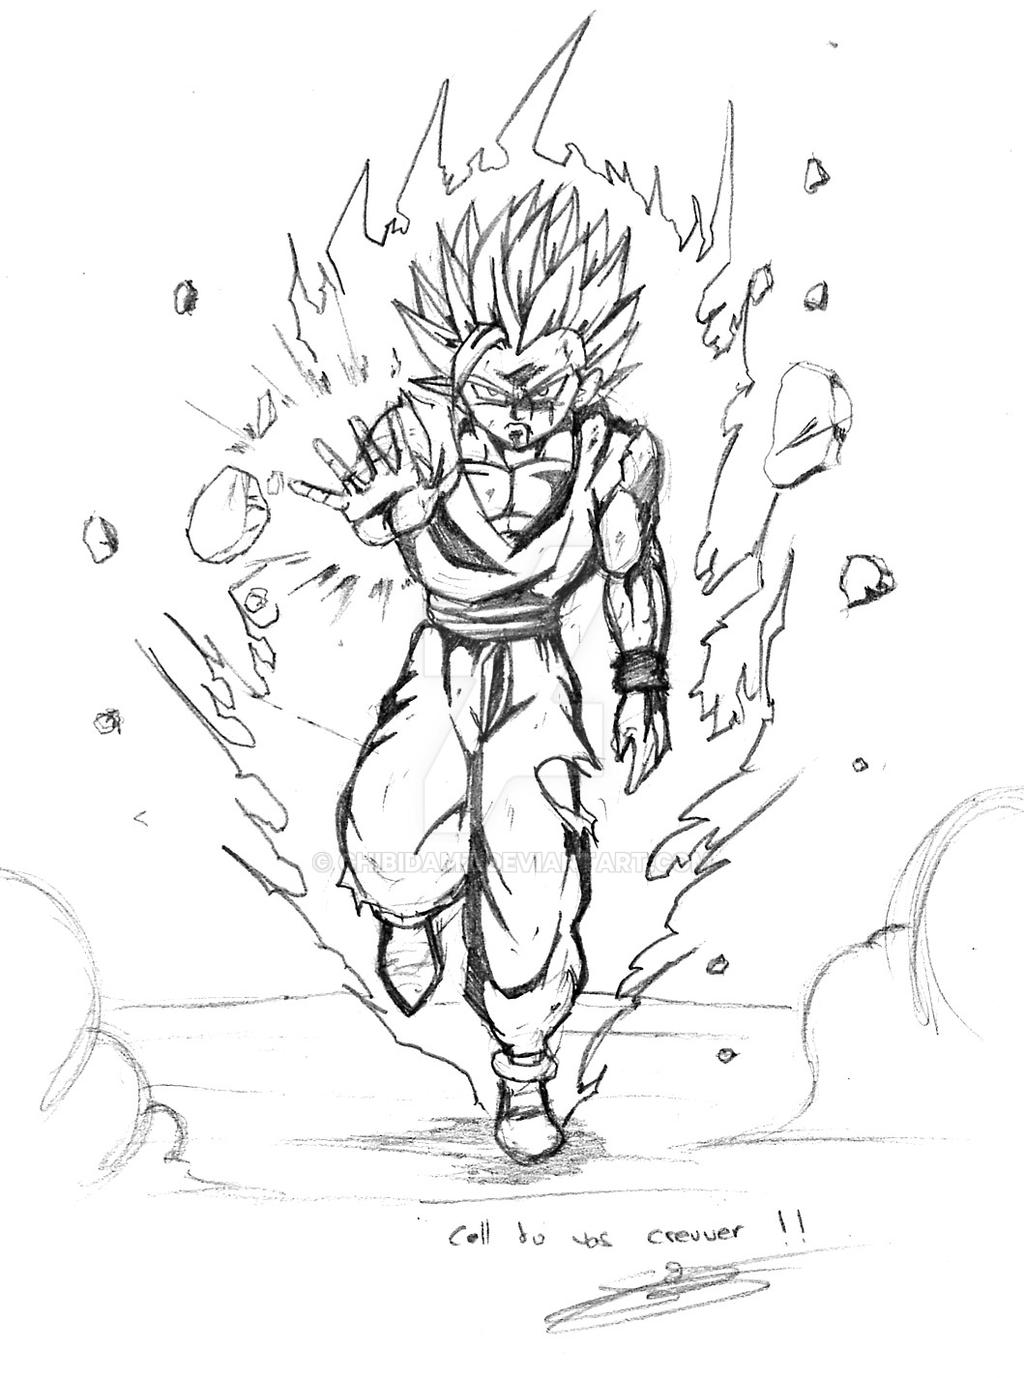 Sketche of gohan ssj2 by chibidamz on deviantart - Dessin de sangohan ...